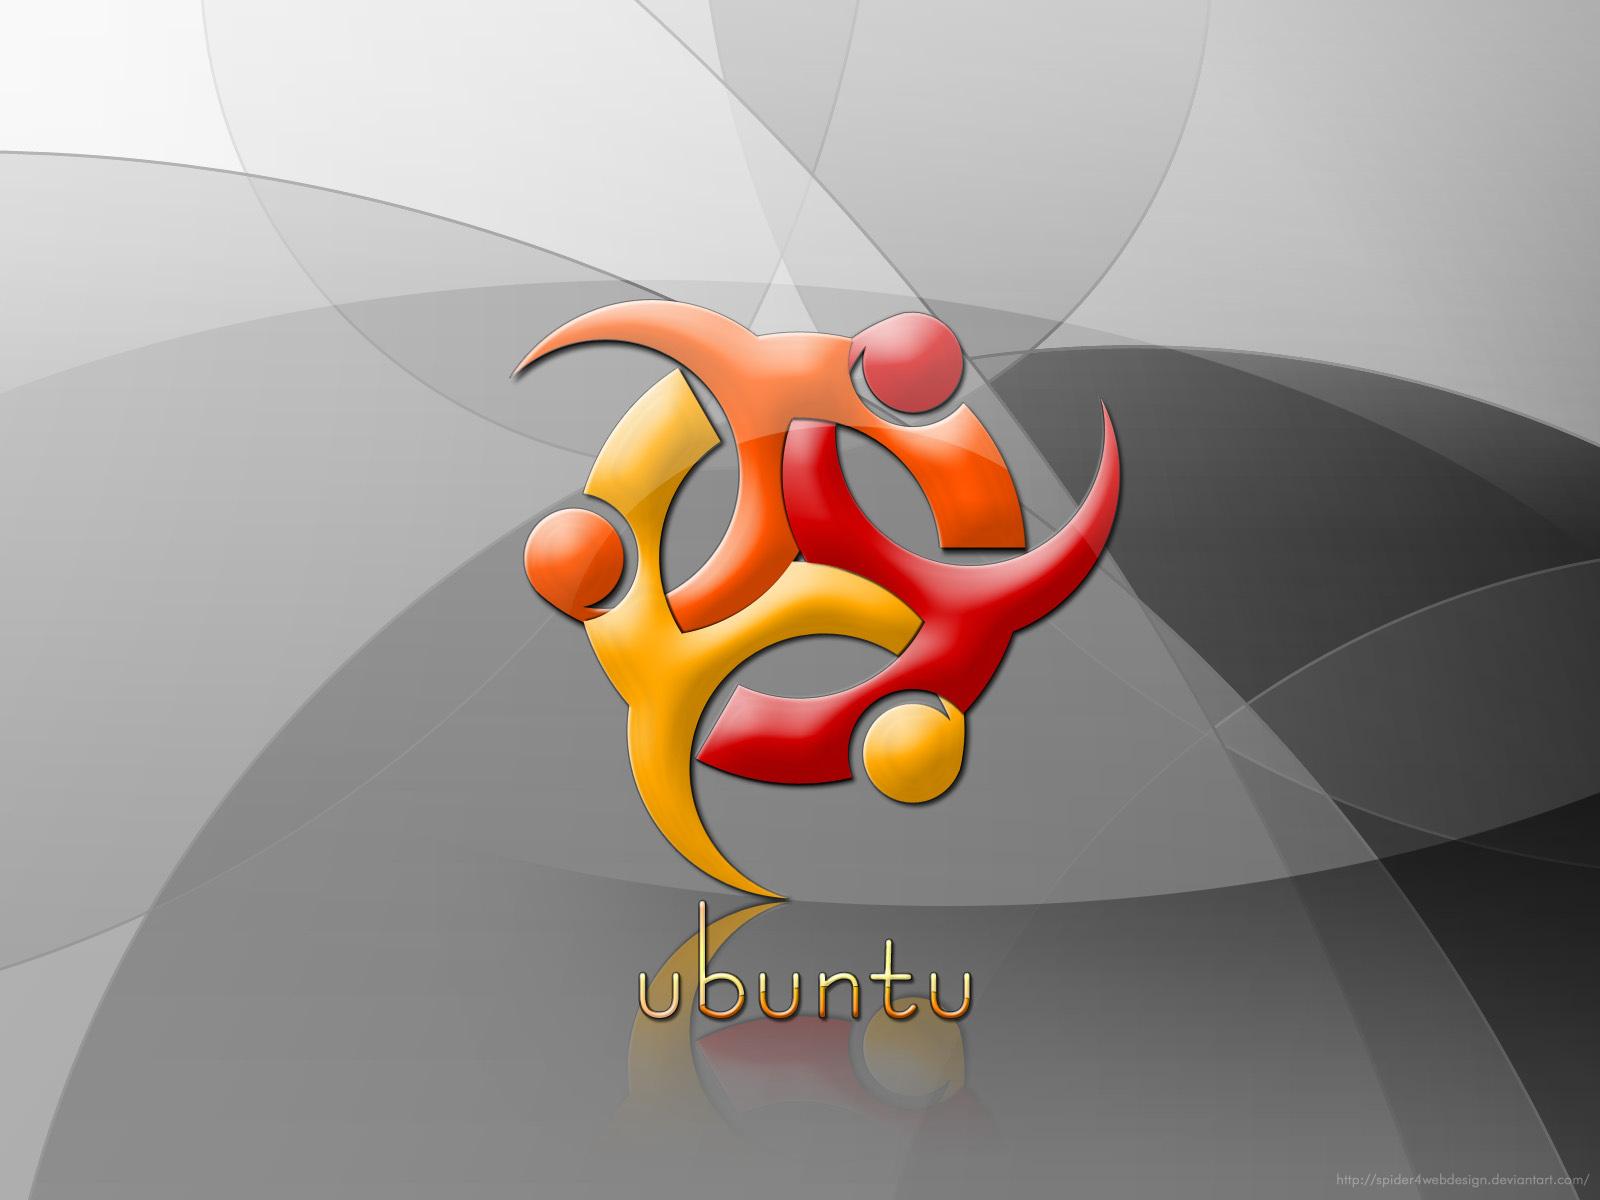 ubuntu black silver brown ubuntu wallpapers 29922 2560x1600 ubuntu 10 1600x1200